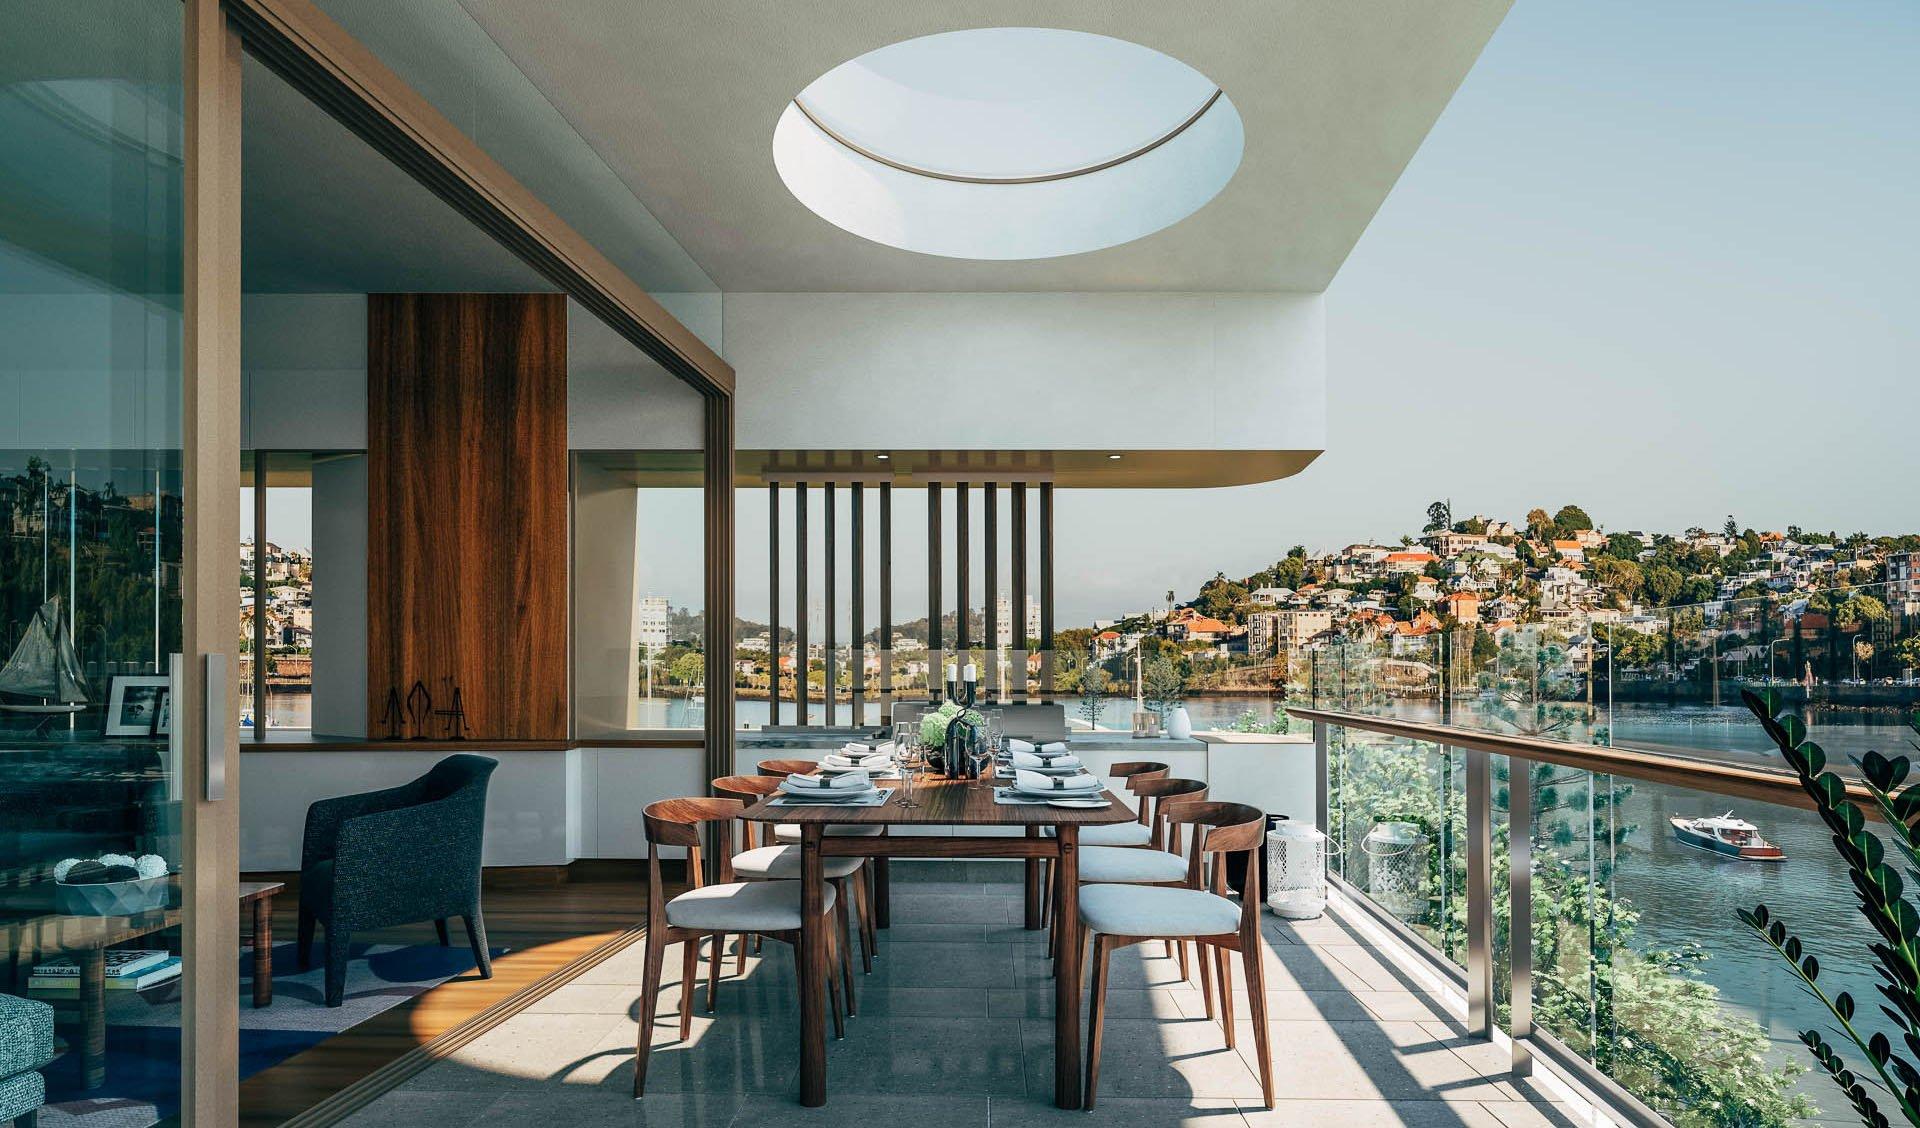 TheBoatYard+Waterfront+Balcony+DiningC